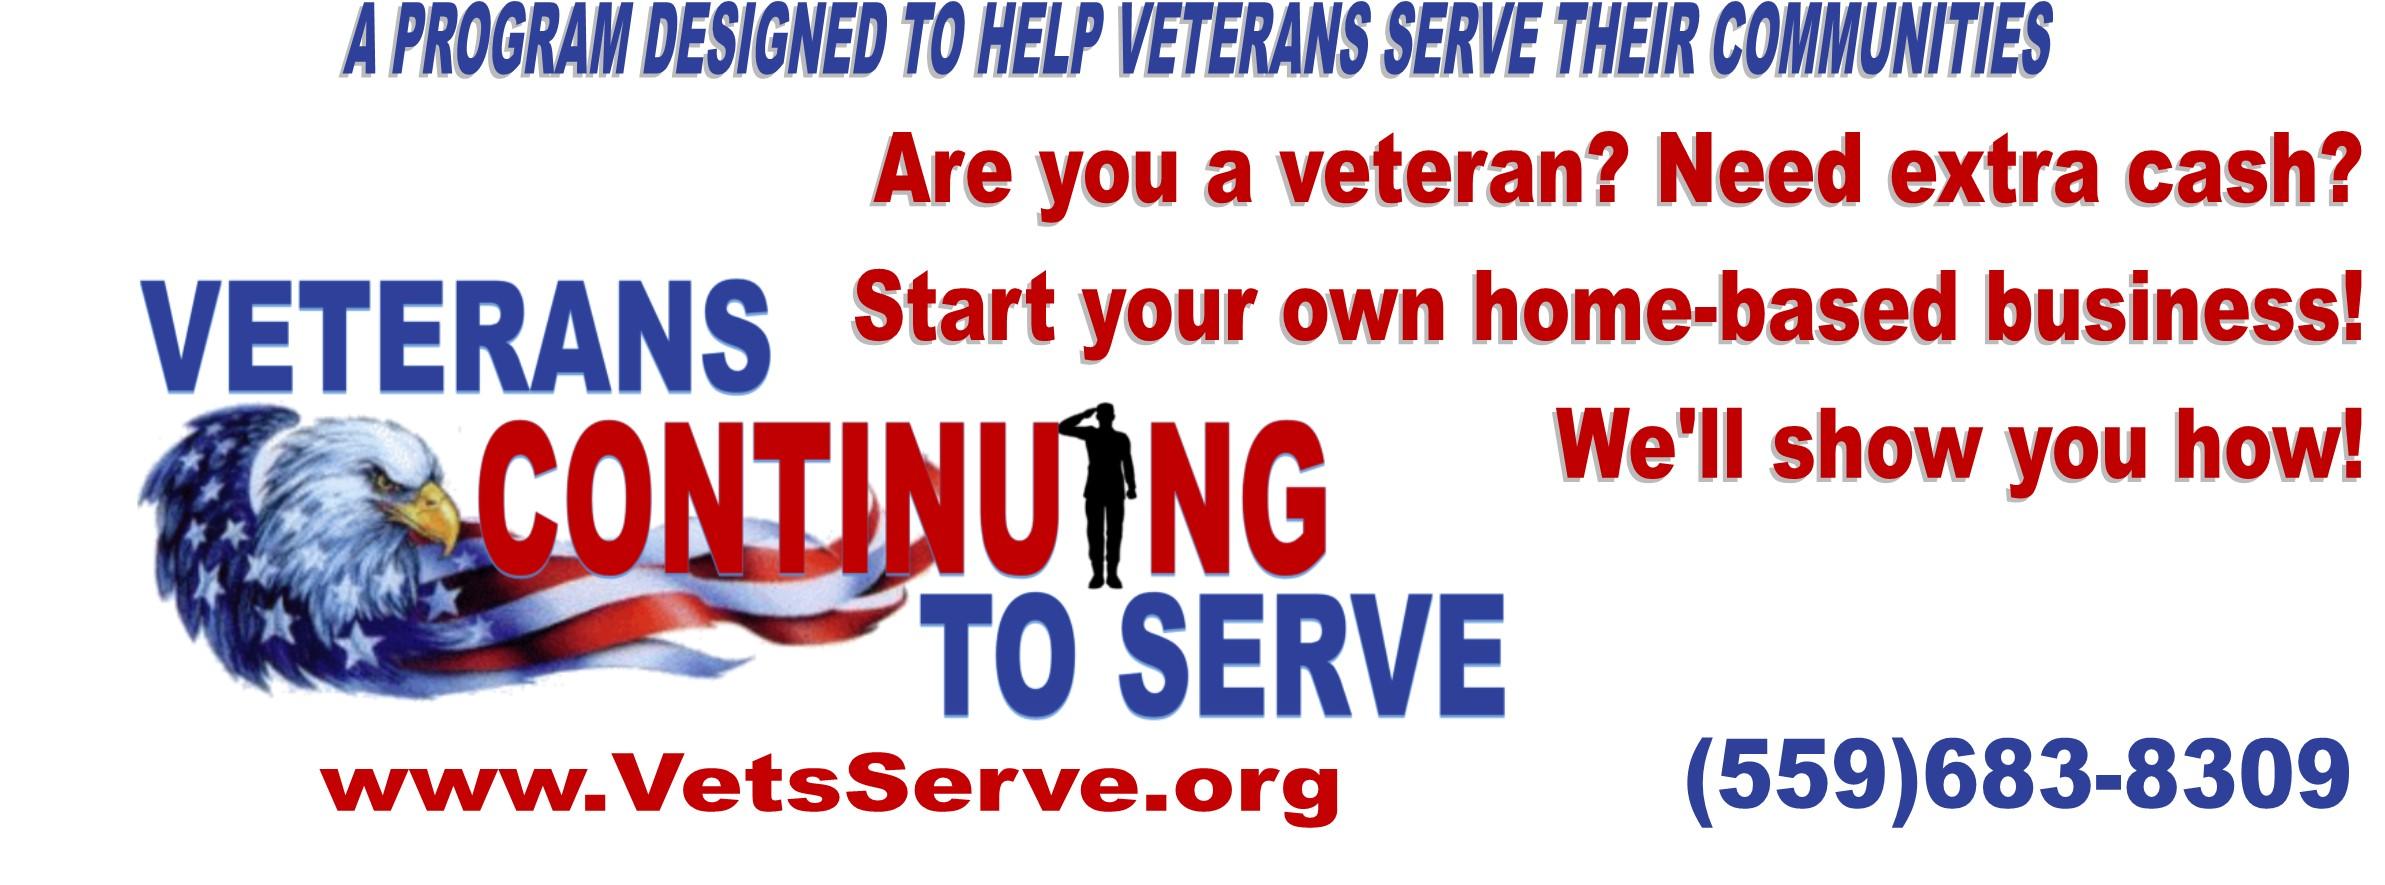 Veterans Continuing To Serve